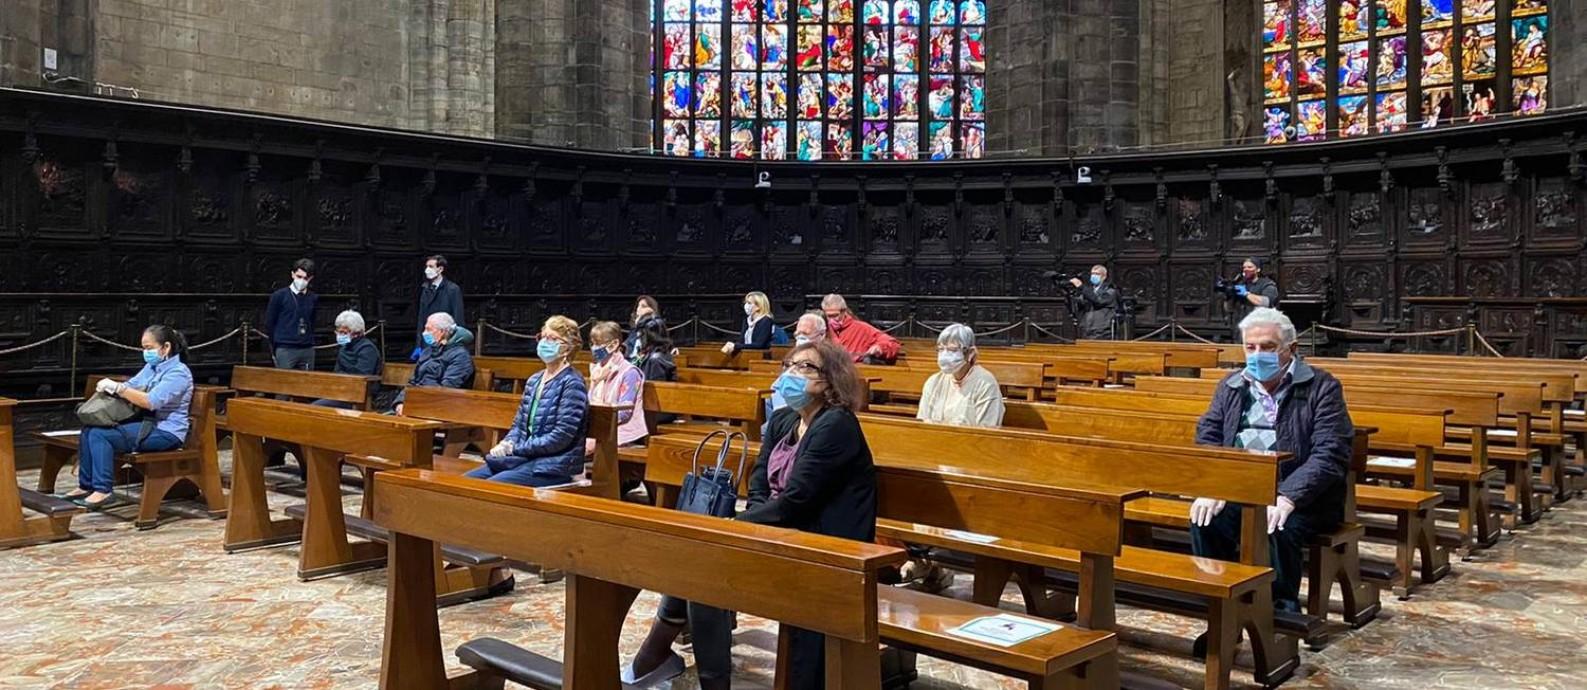 Missa realizada na Capela Feriale, dentro da Catedral Duomo, nesta segunda-feira (18) Foto: Fernanda Massarotto